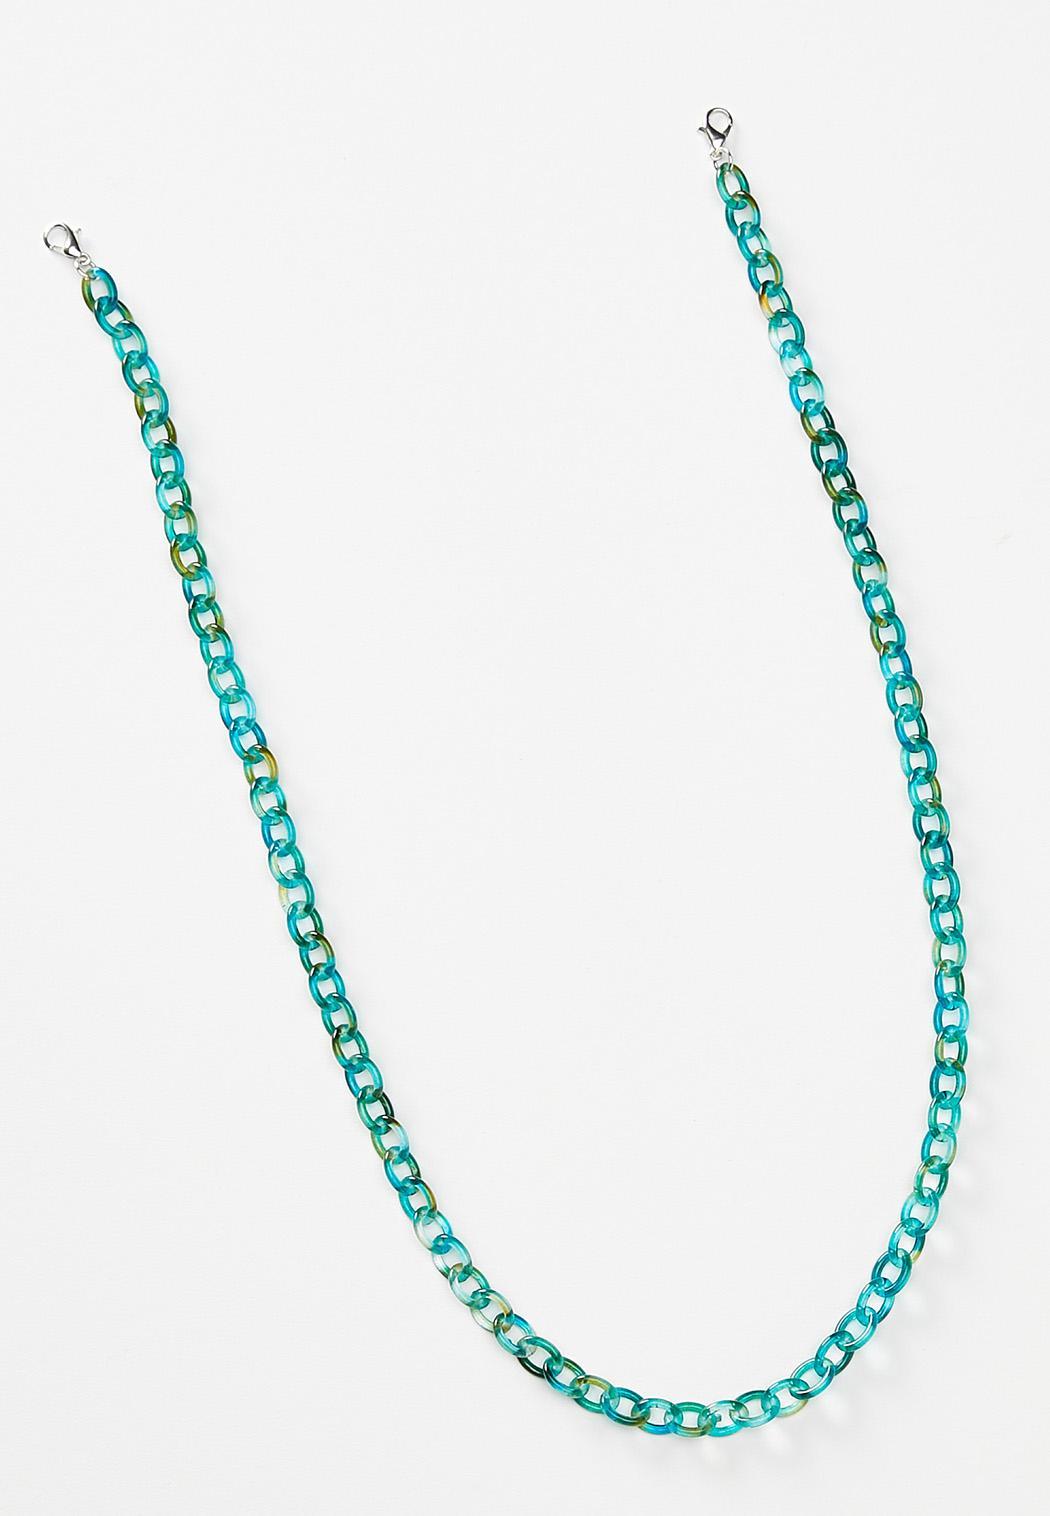 Acrylic Link Mask Chain